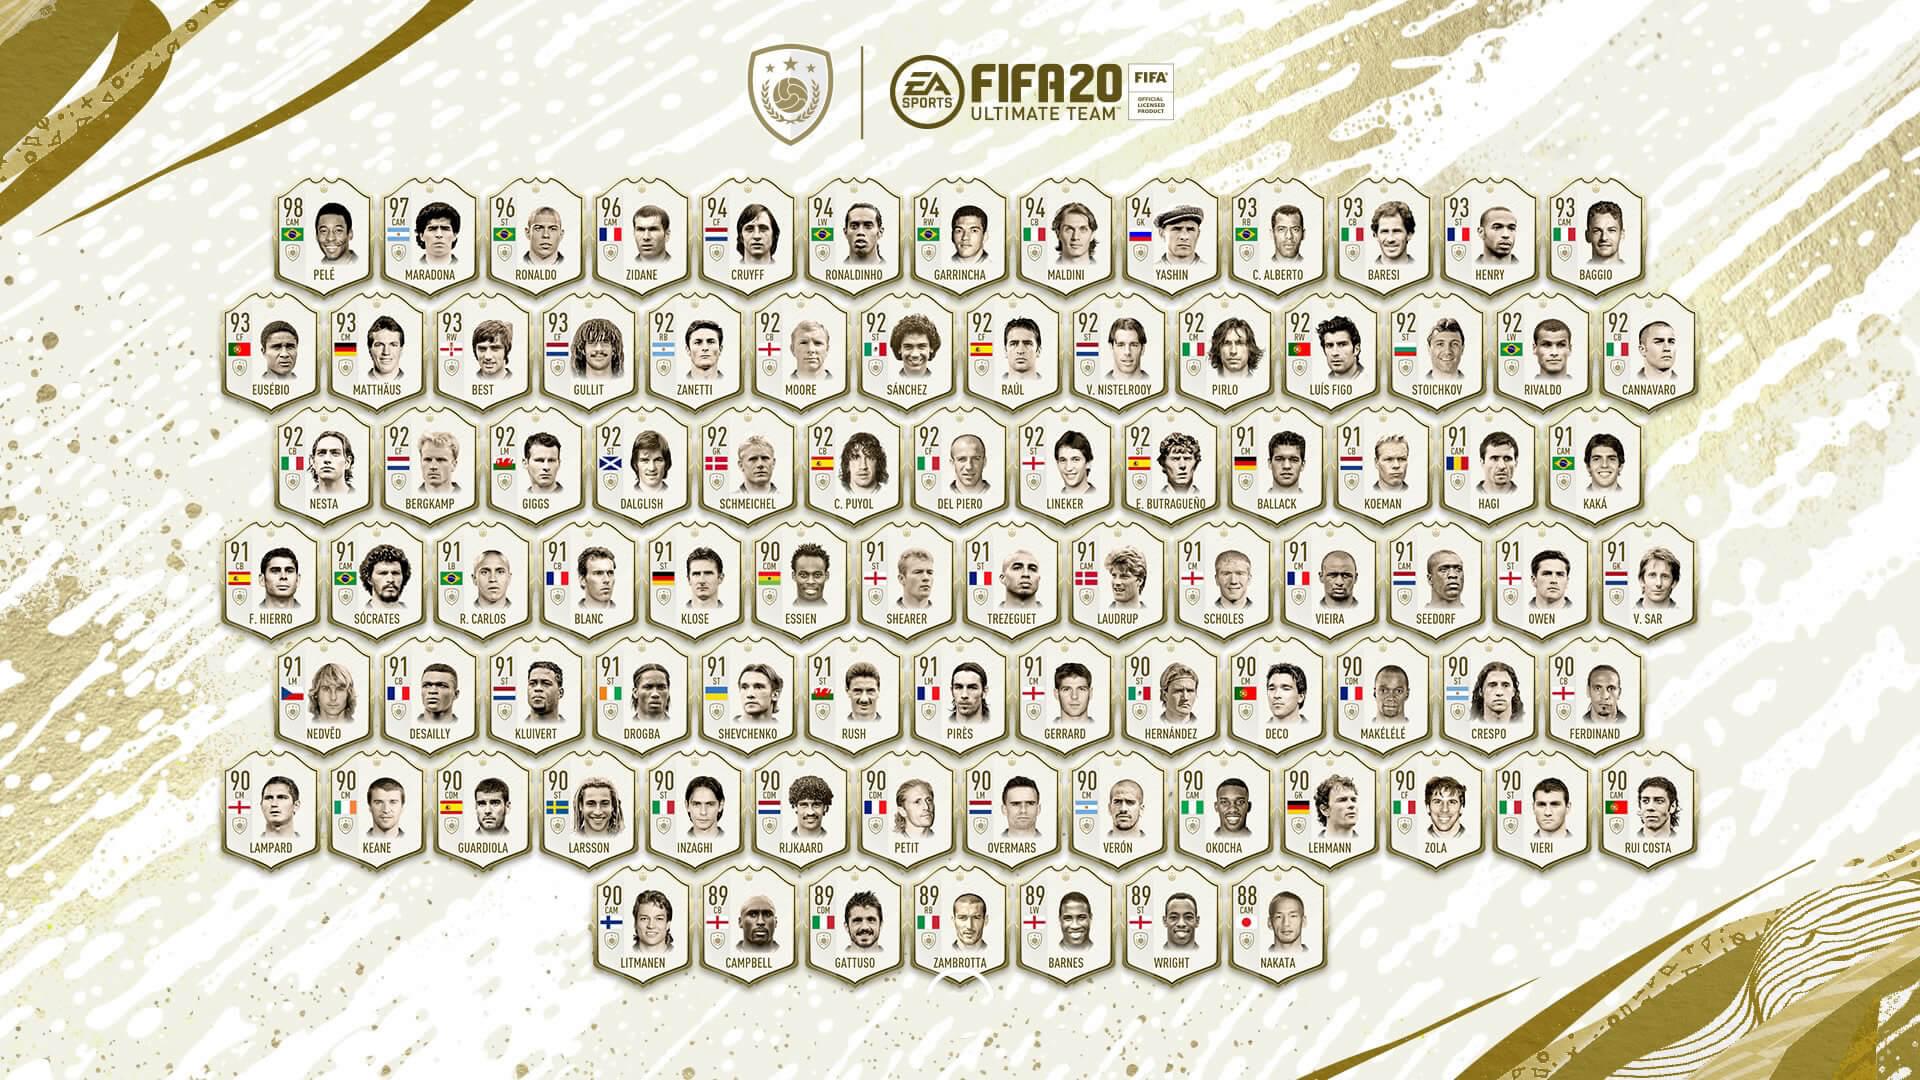 Iconos Prime de FIFA 20